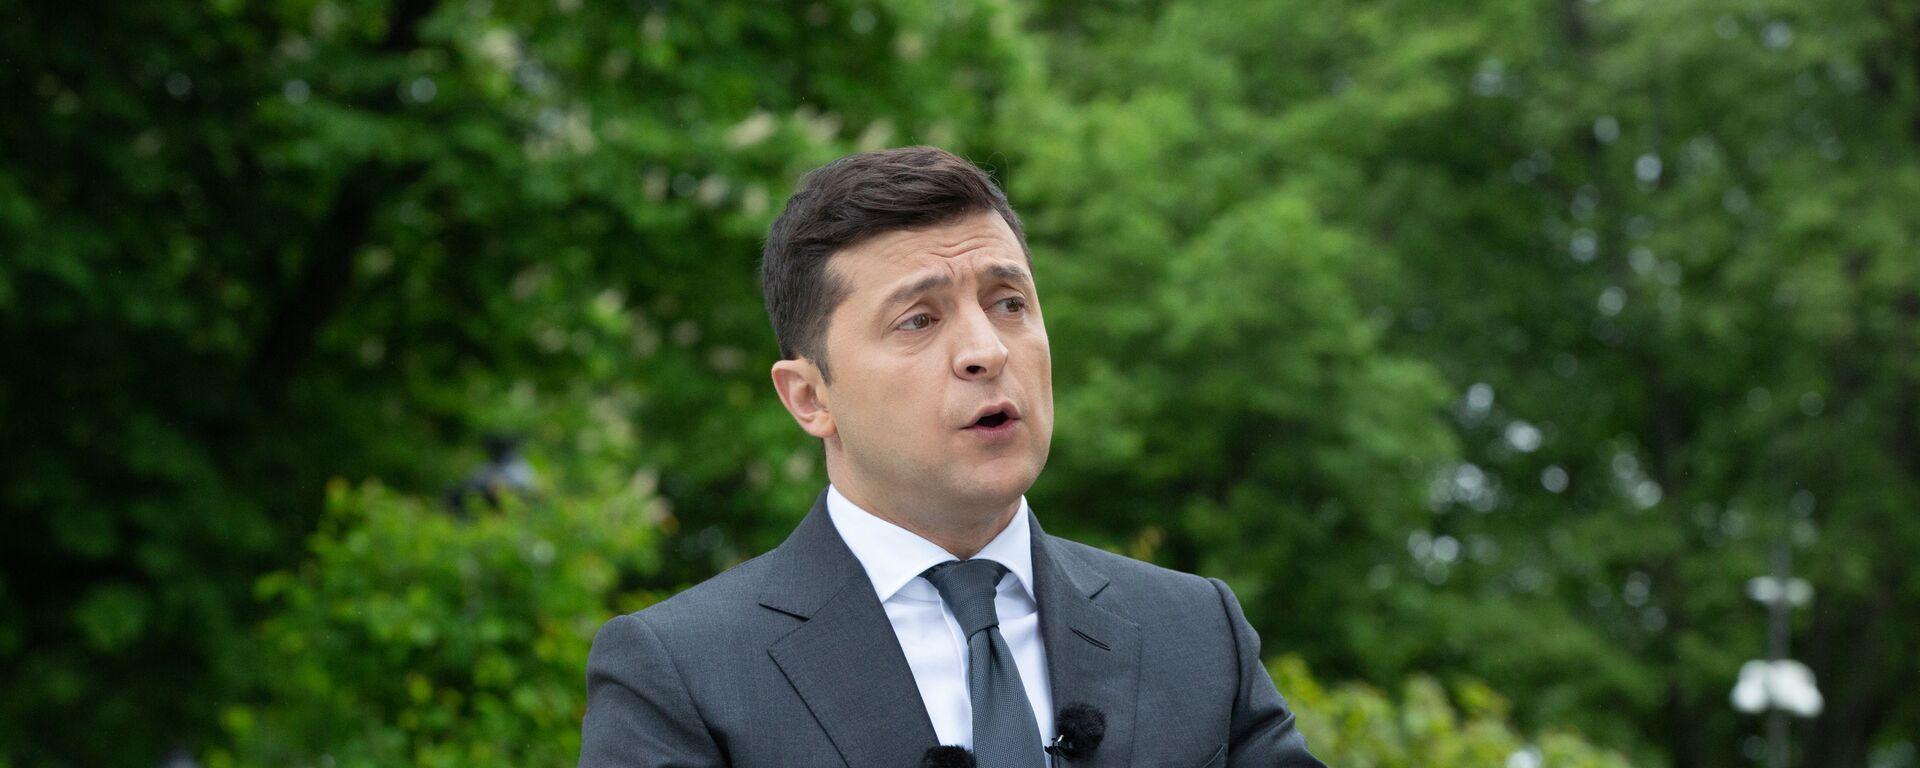 Volodímir Zelenski, presidente de Ucrania - Sputnik Mundo, 1920, 08.06.2021